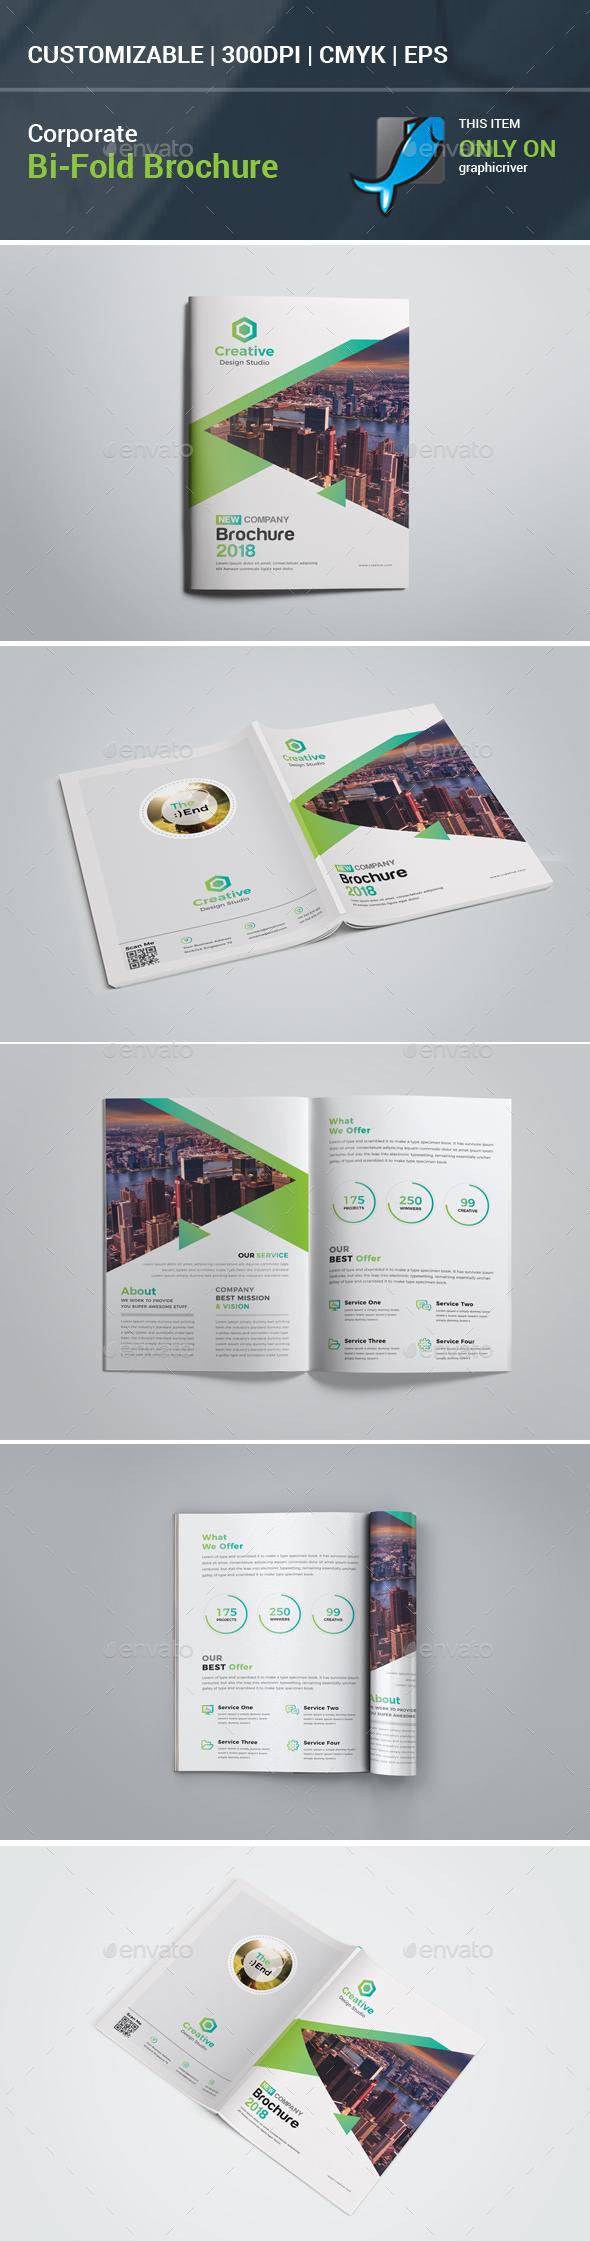 Bi-Fold Brochure - Stationery Print Templates